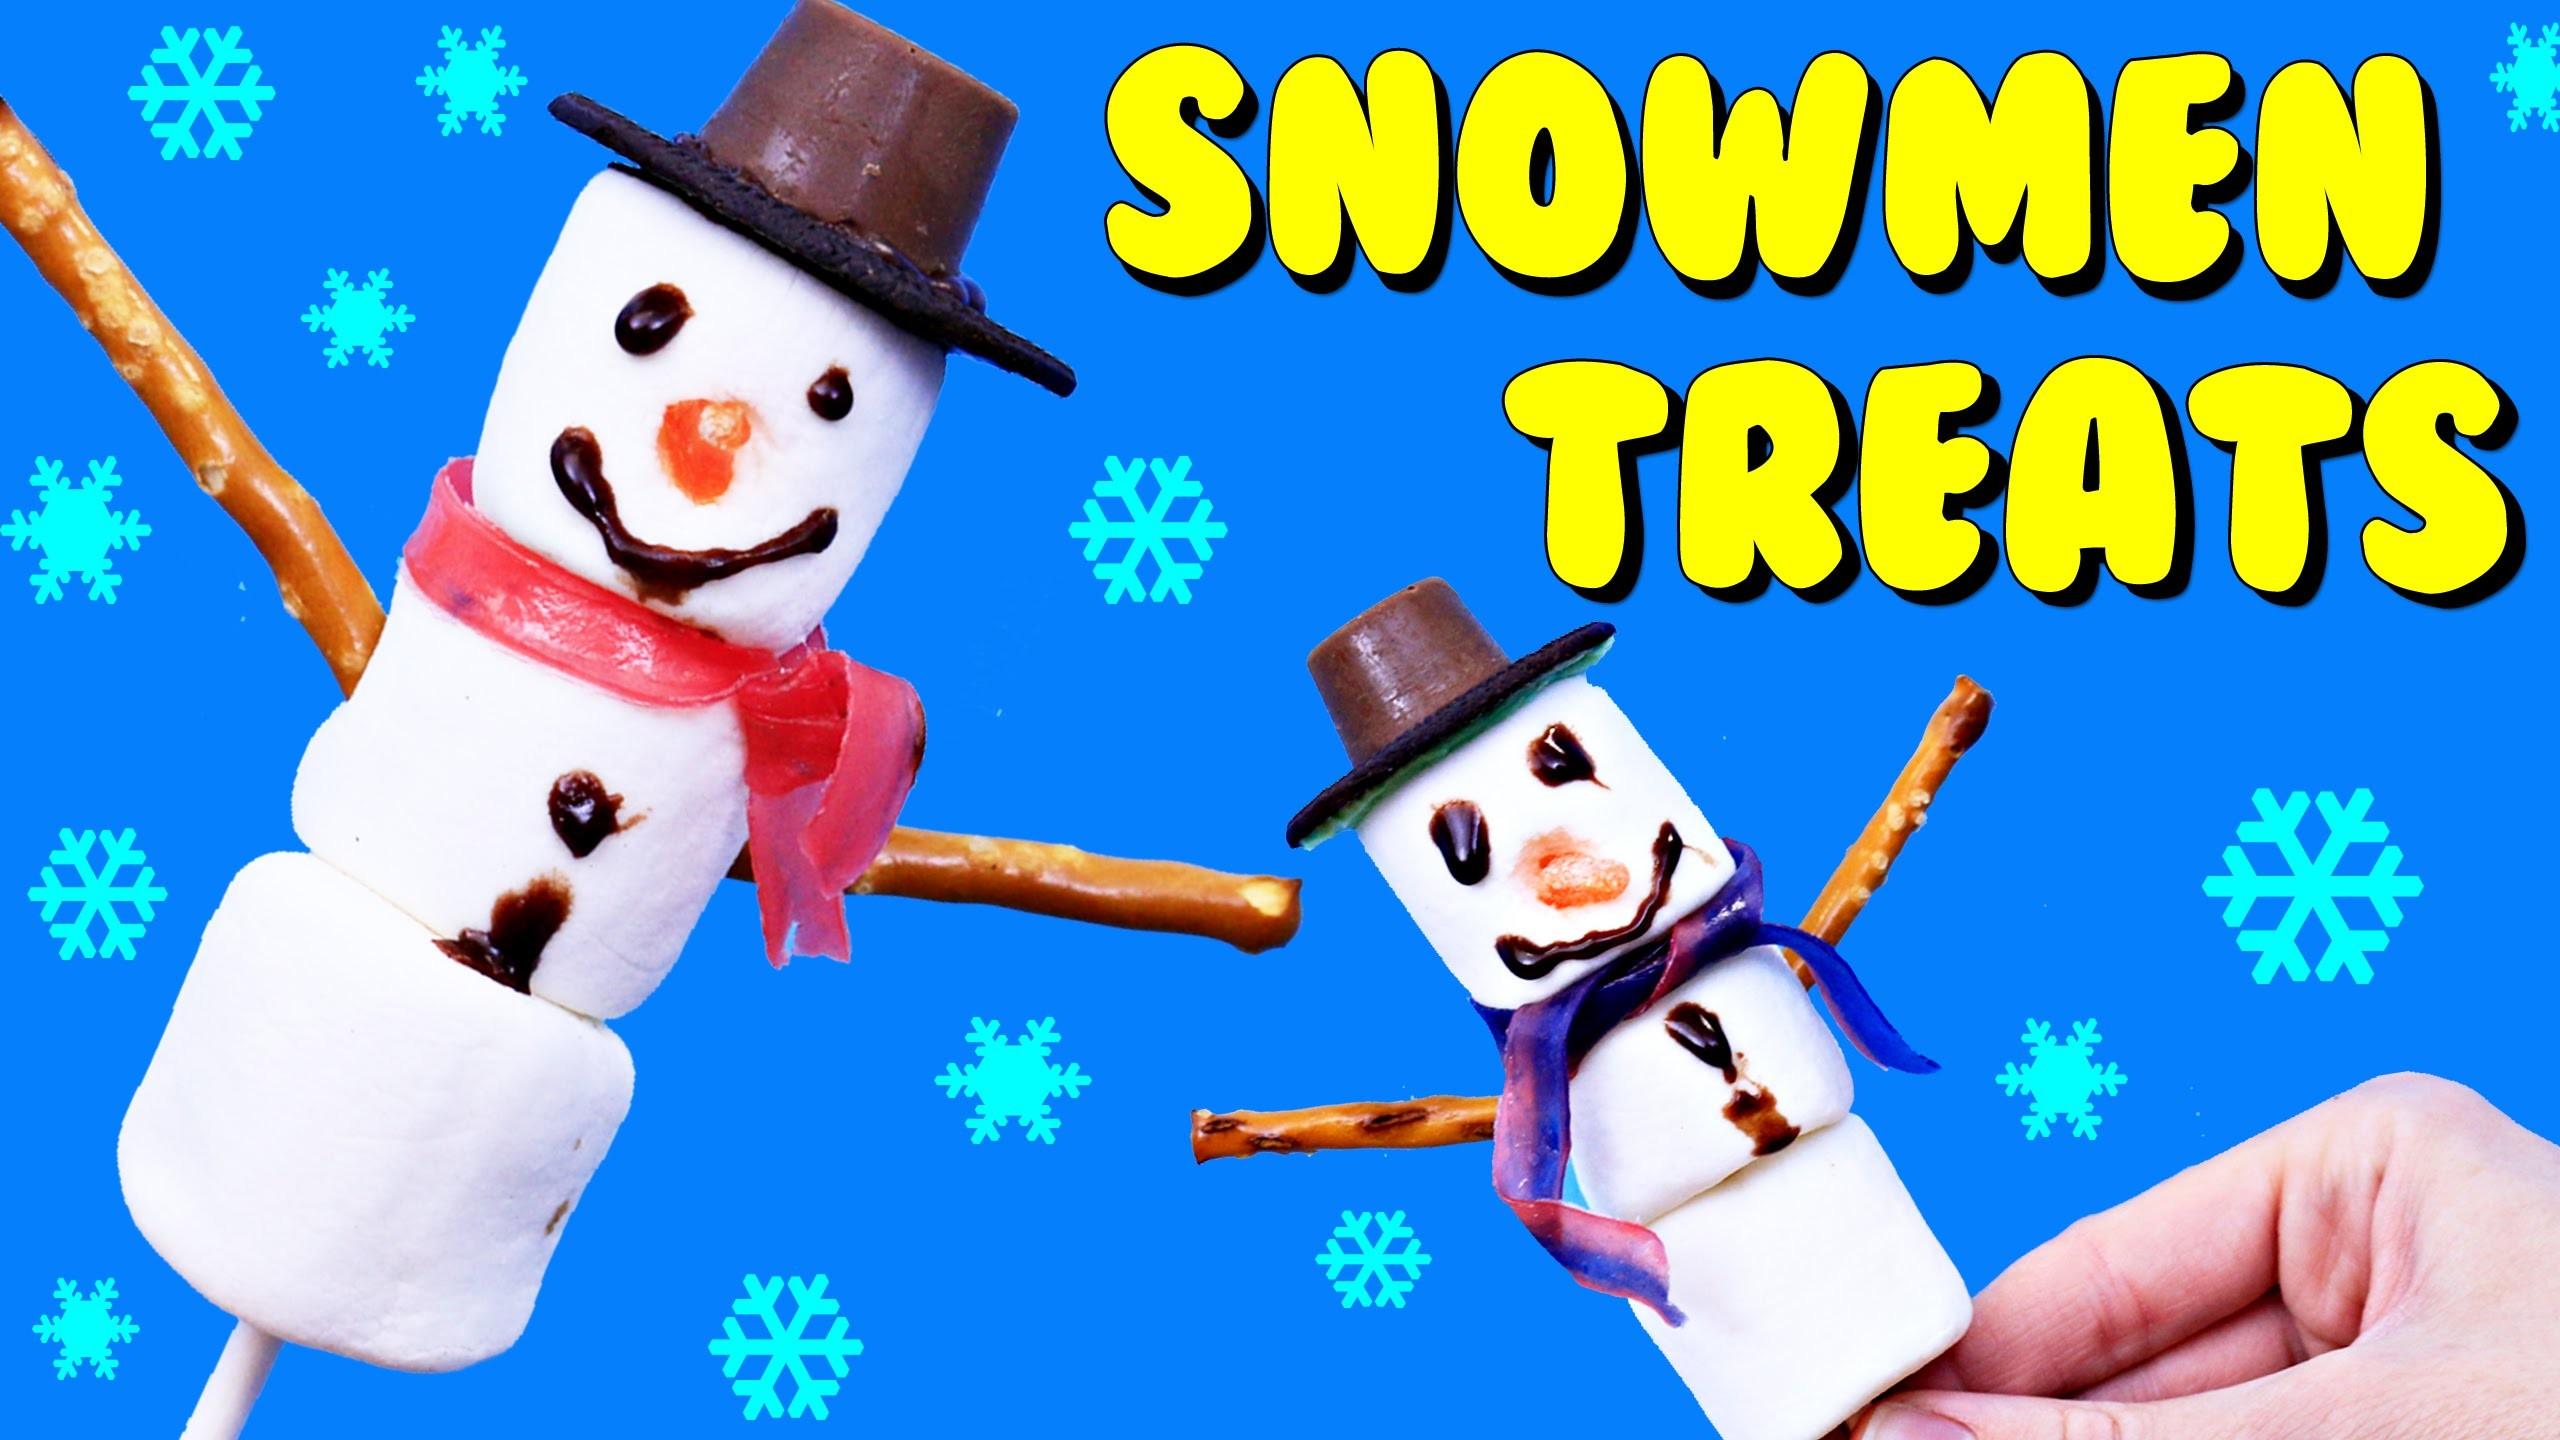 MARSHMALLOW SNOWMEN Christmas Treats Dessert DIY EASY Kid Cookies & Surprise Toys Ornaments